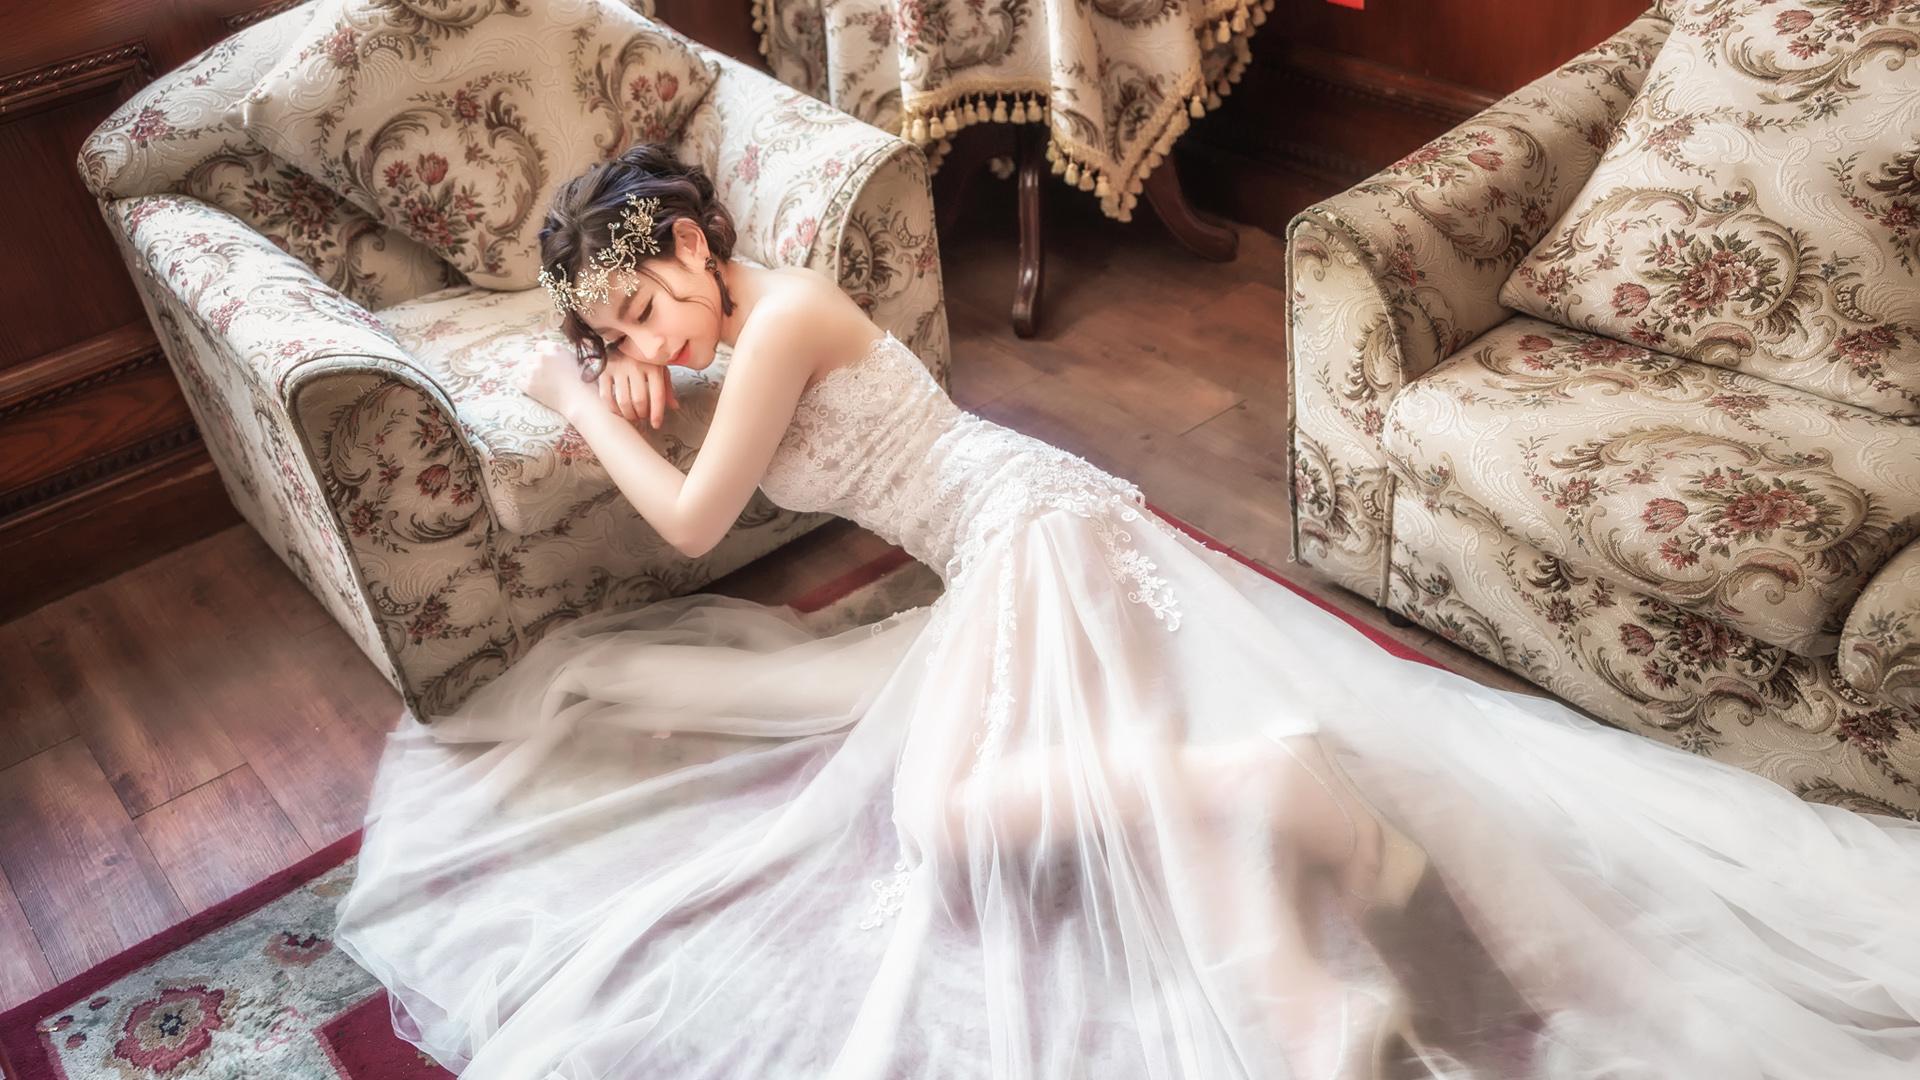 Women Model Photography Asian Brides Hair Ornament Wedding Dress Closed Eyes Women Indoors On The Fl 1920x1080